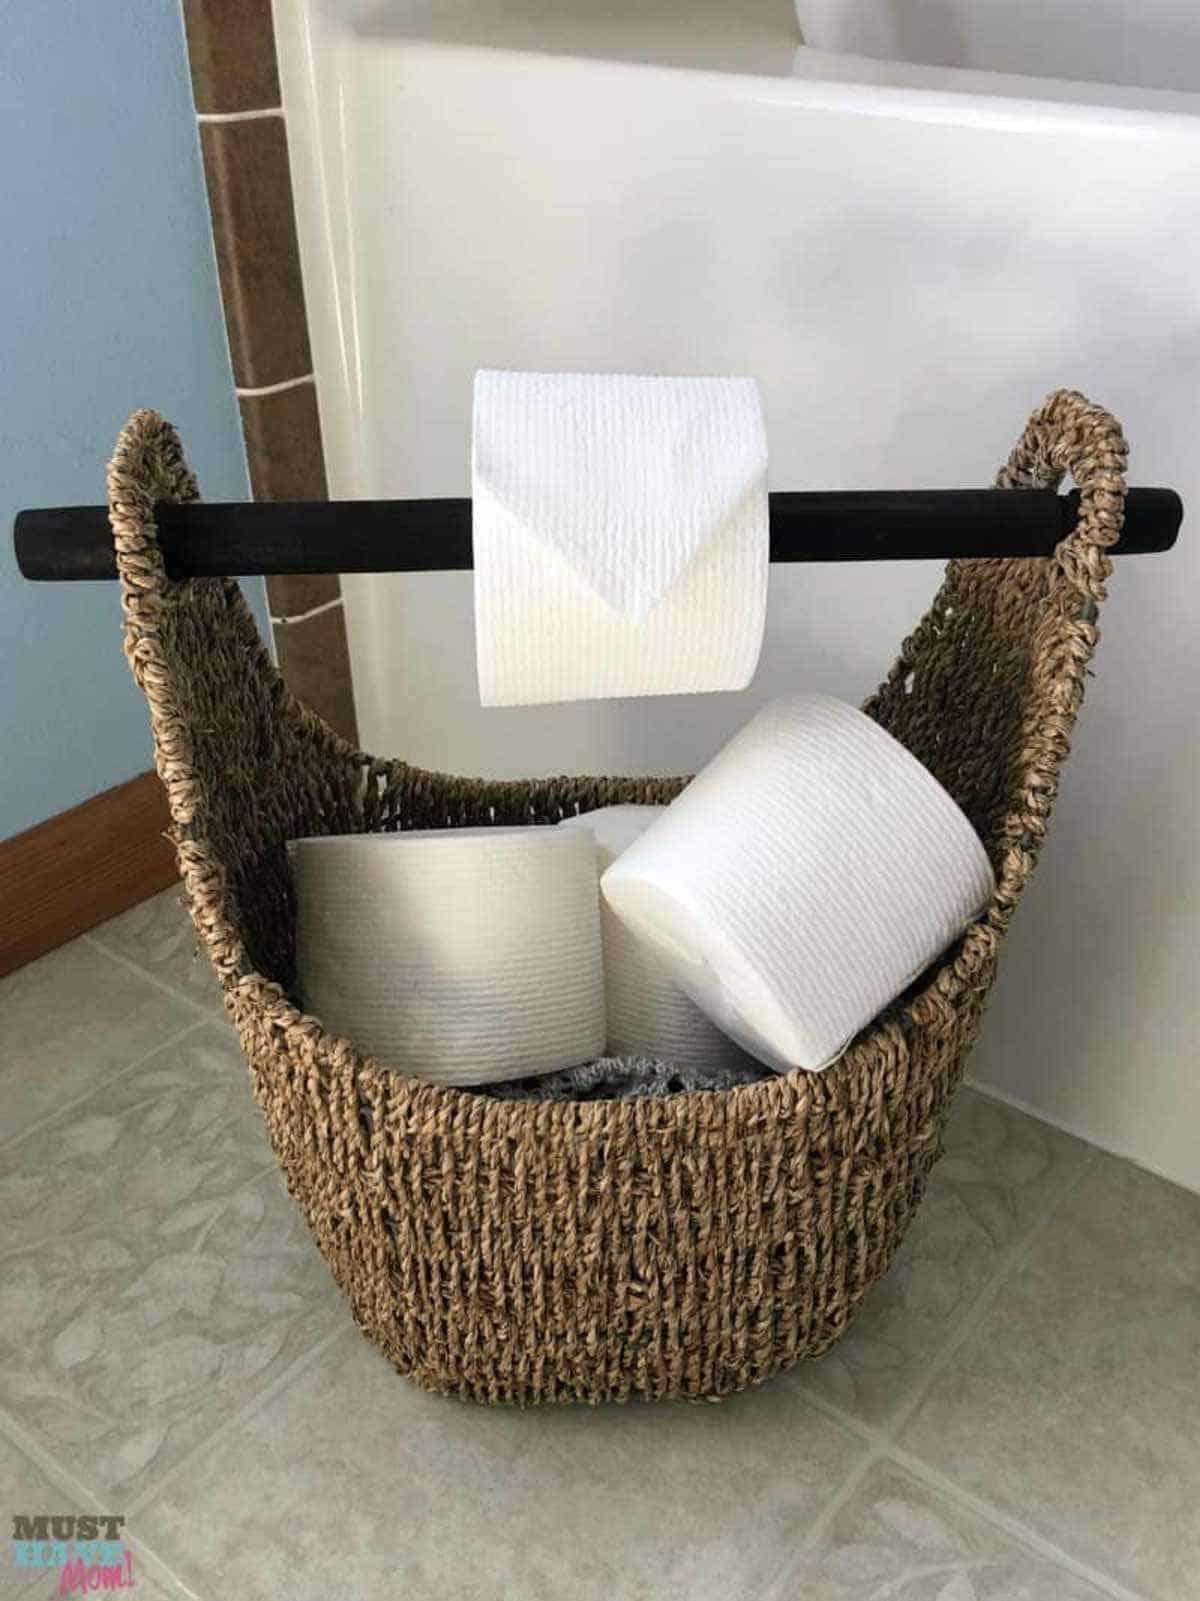 Toilet Paper Holder in a Basket